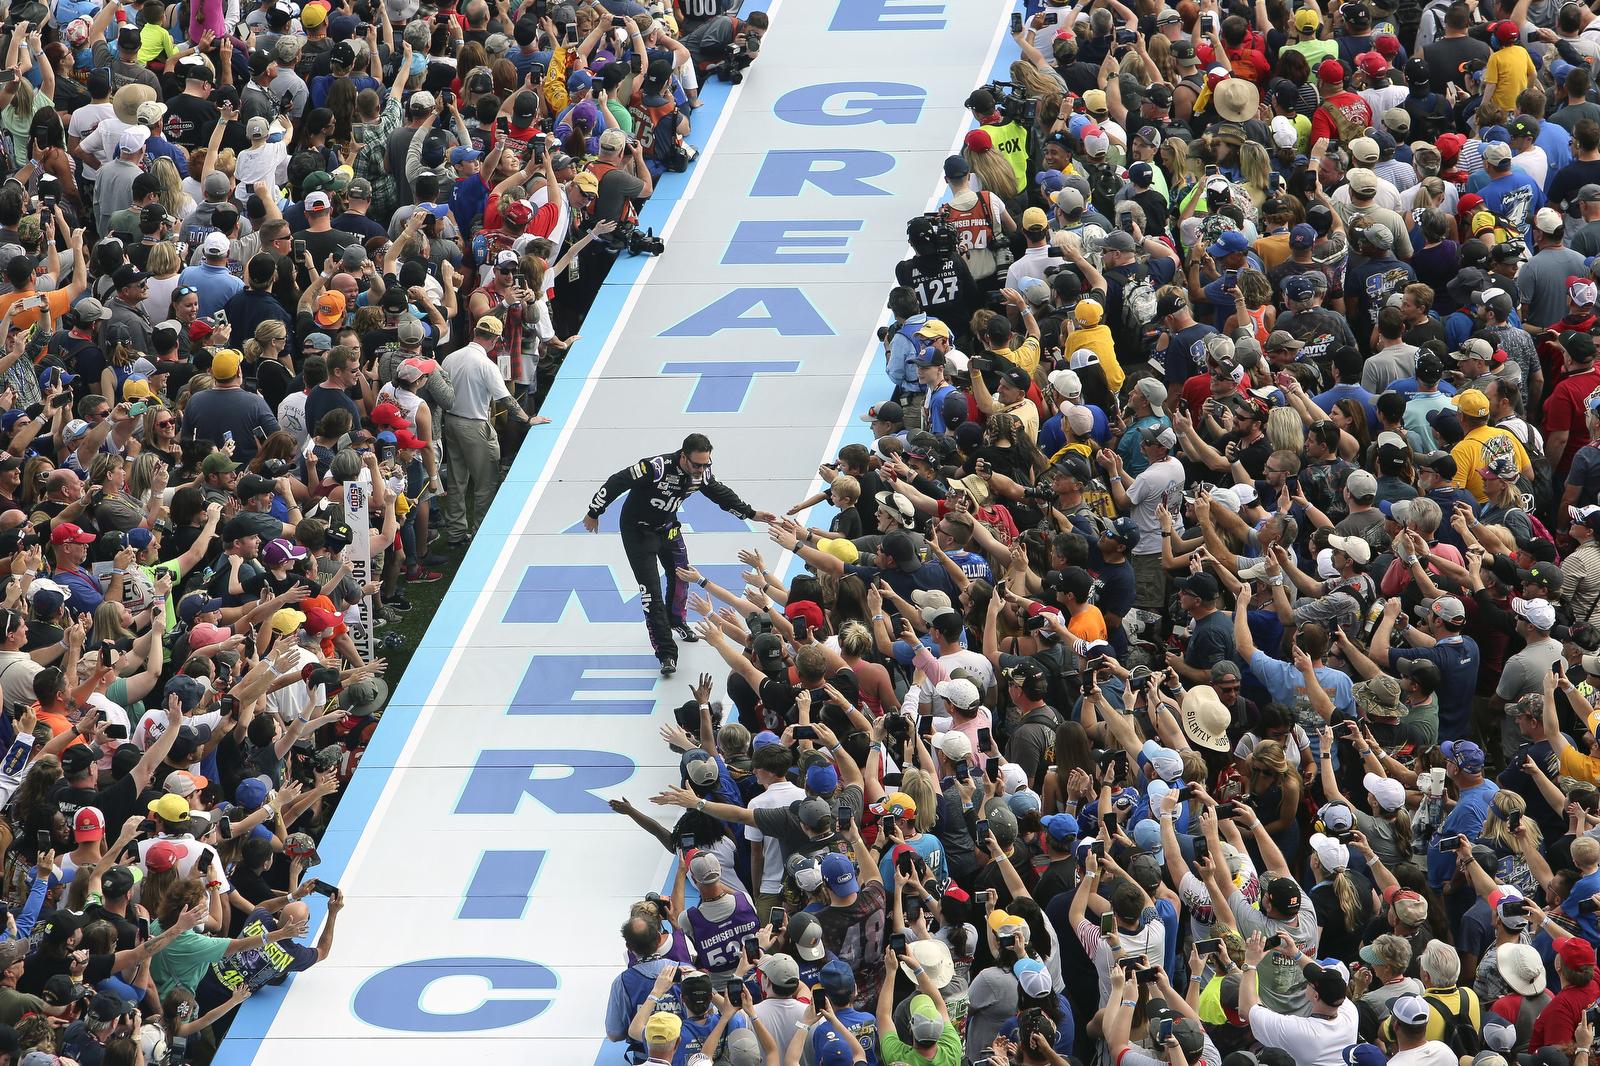 Jimmie Johnson greets fans during driver introductions before the NASCAR Daytona 500 auto race at Daytona International Speedway, Sunday, Feb. 16, 2020, in Daytona Beach, Fla. AP